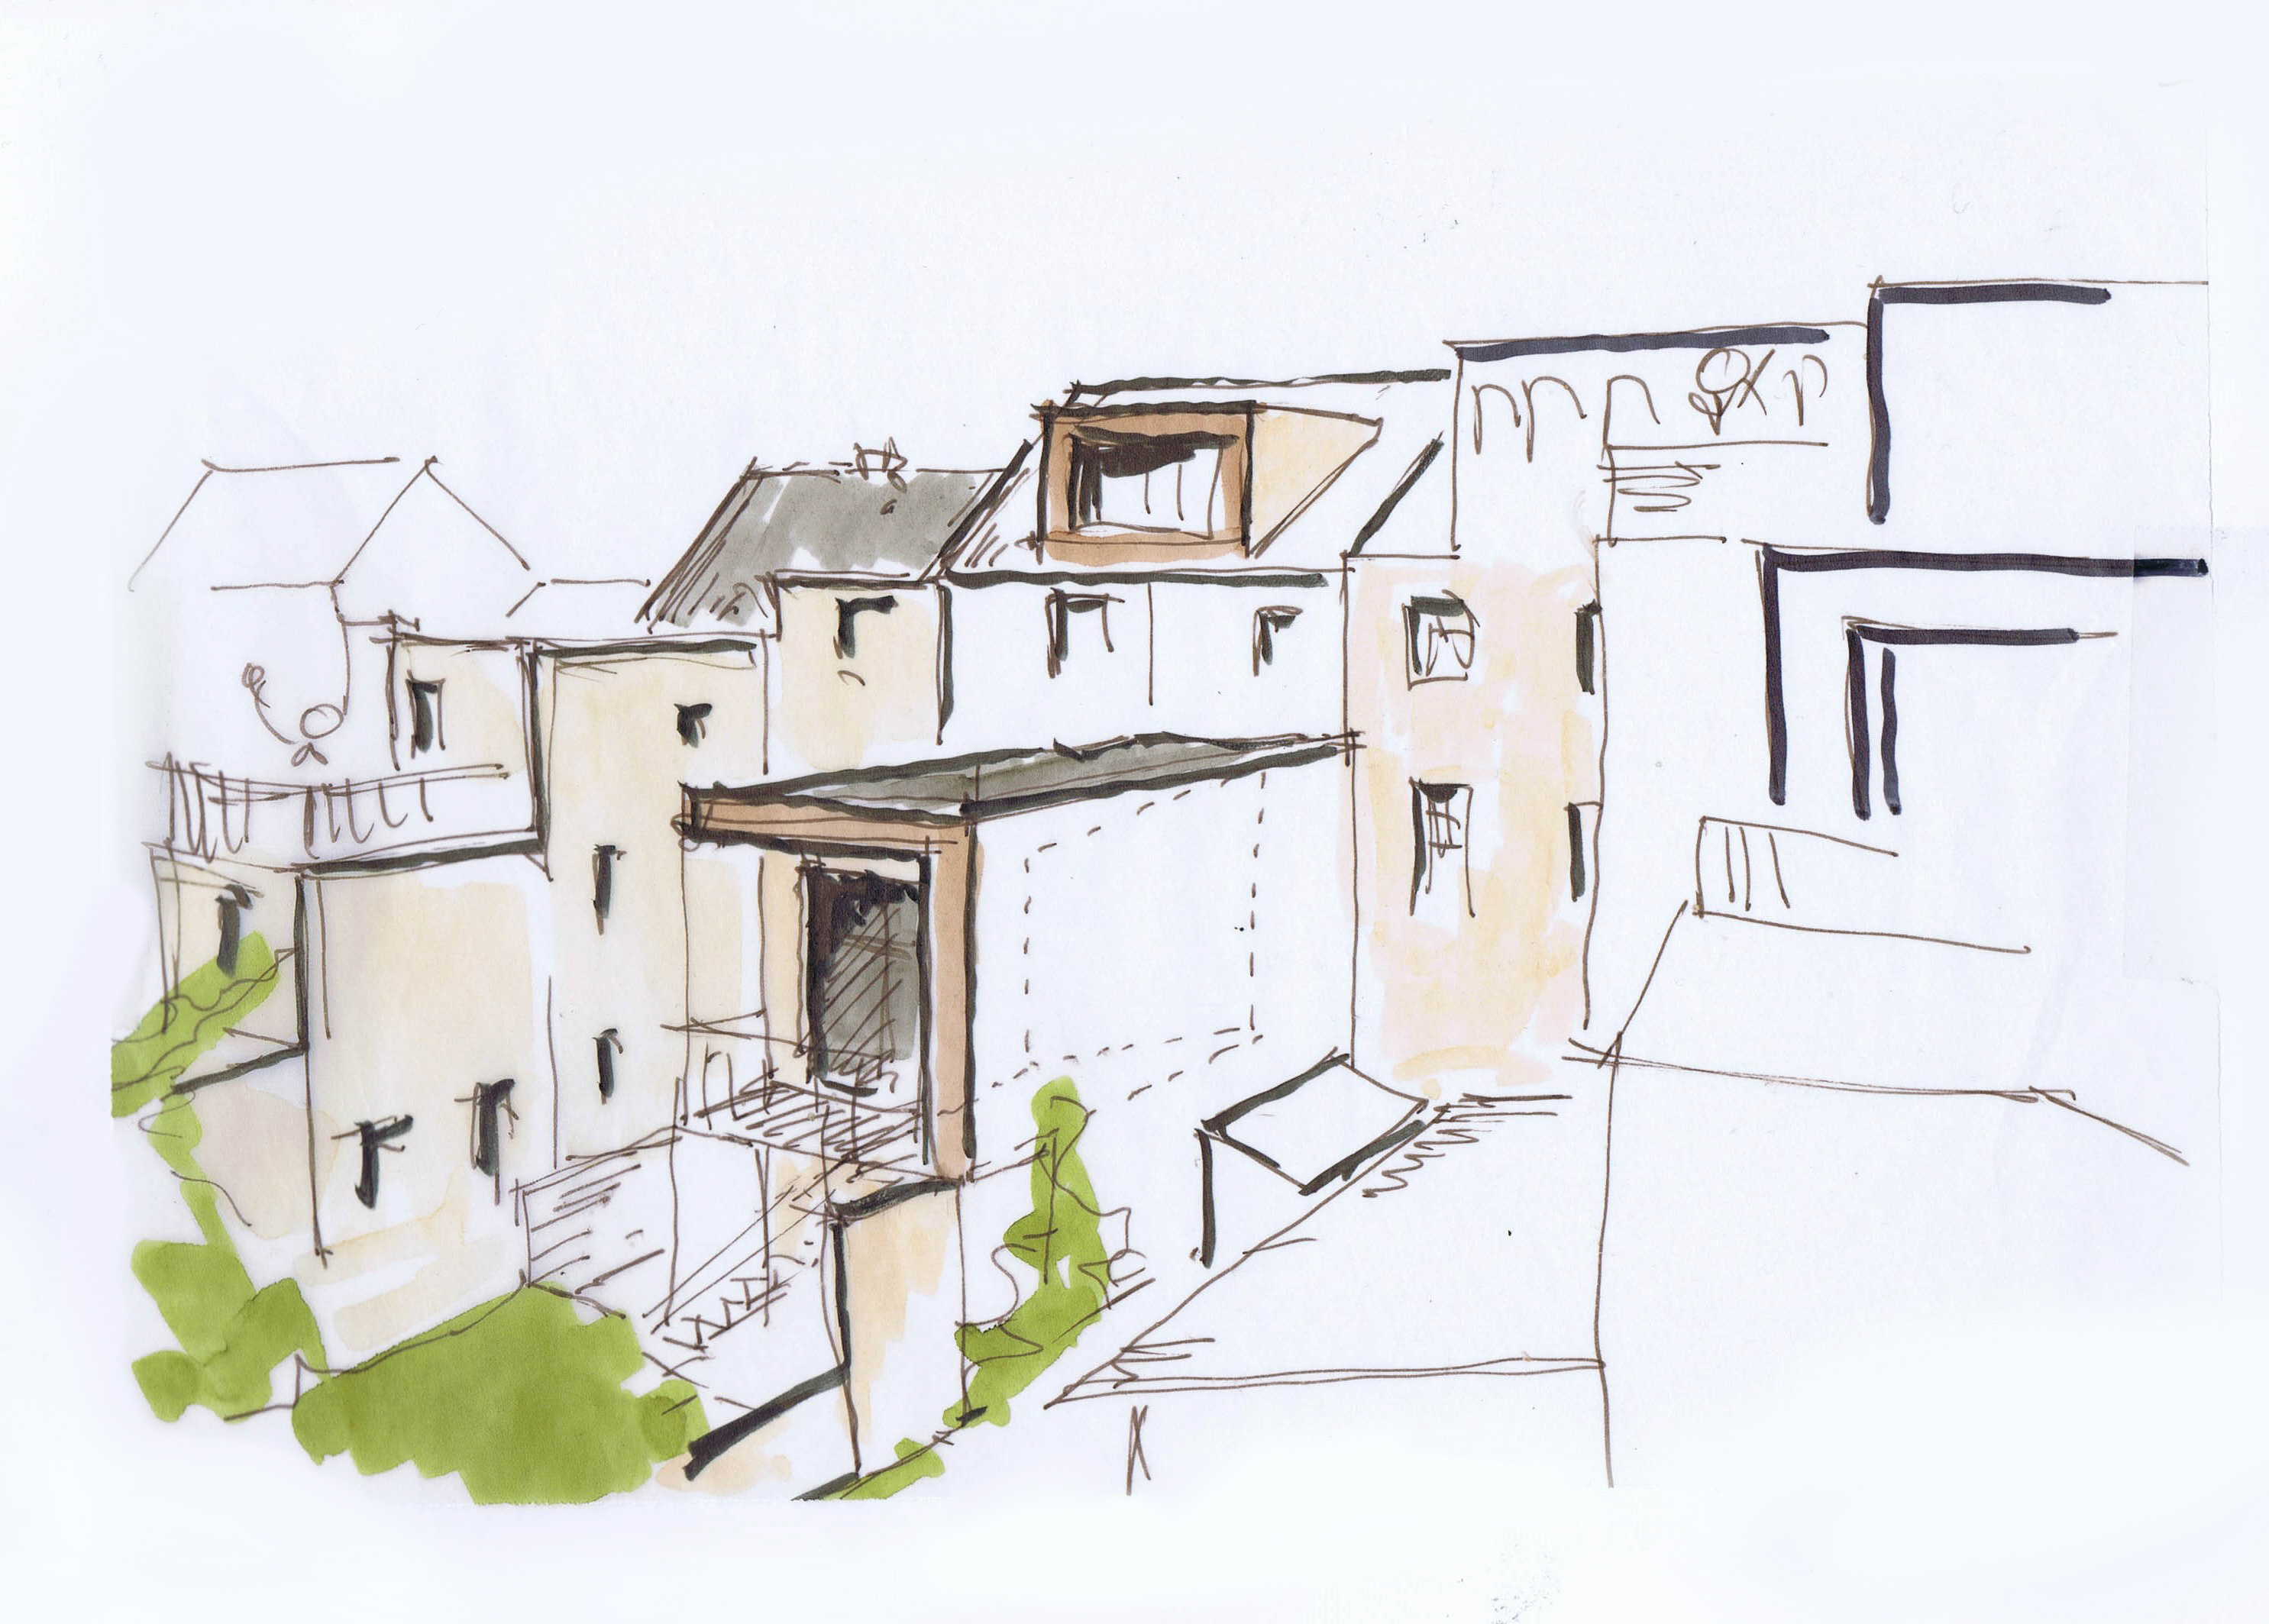 Stadthaus mit kubus architektur michael k walther - Architektur kubus ...